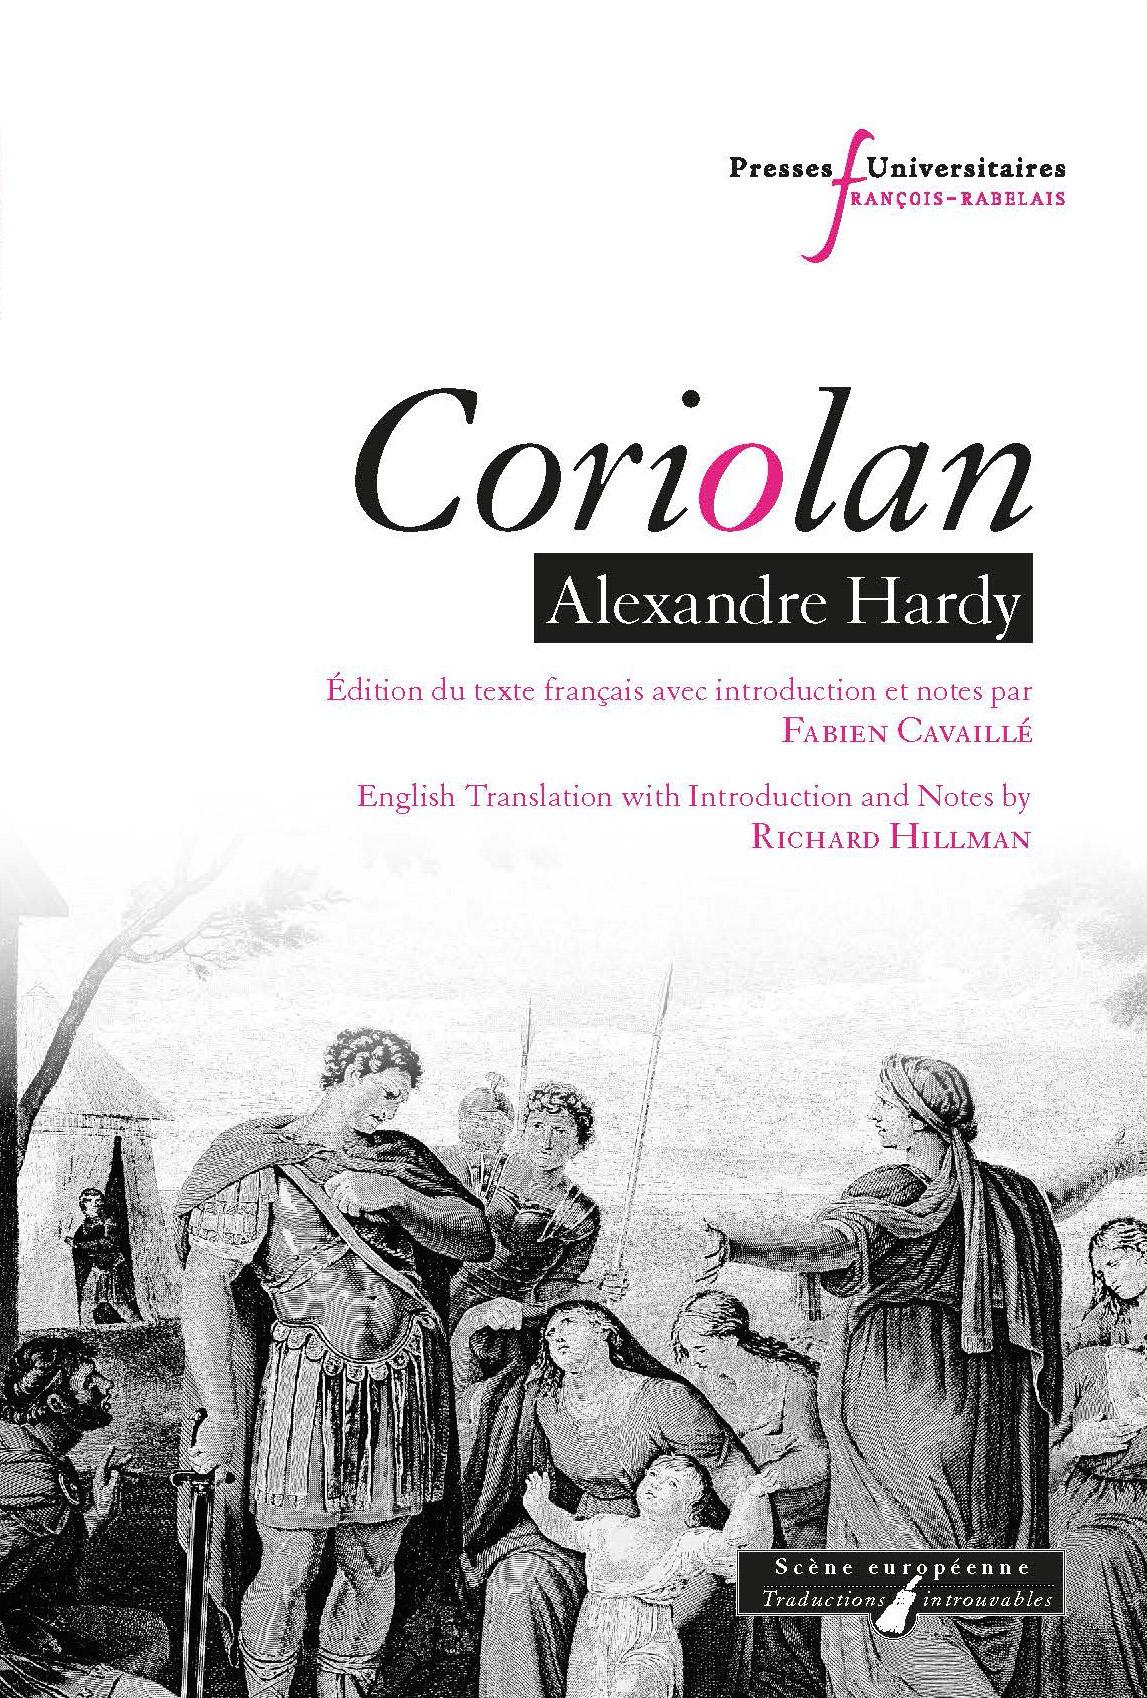 Coriolan, Alexandre Hardy